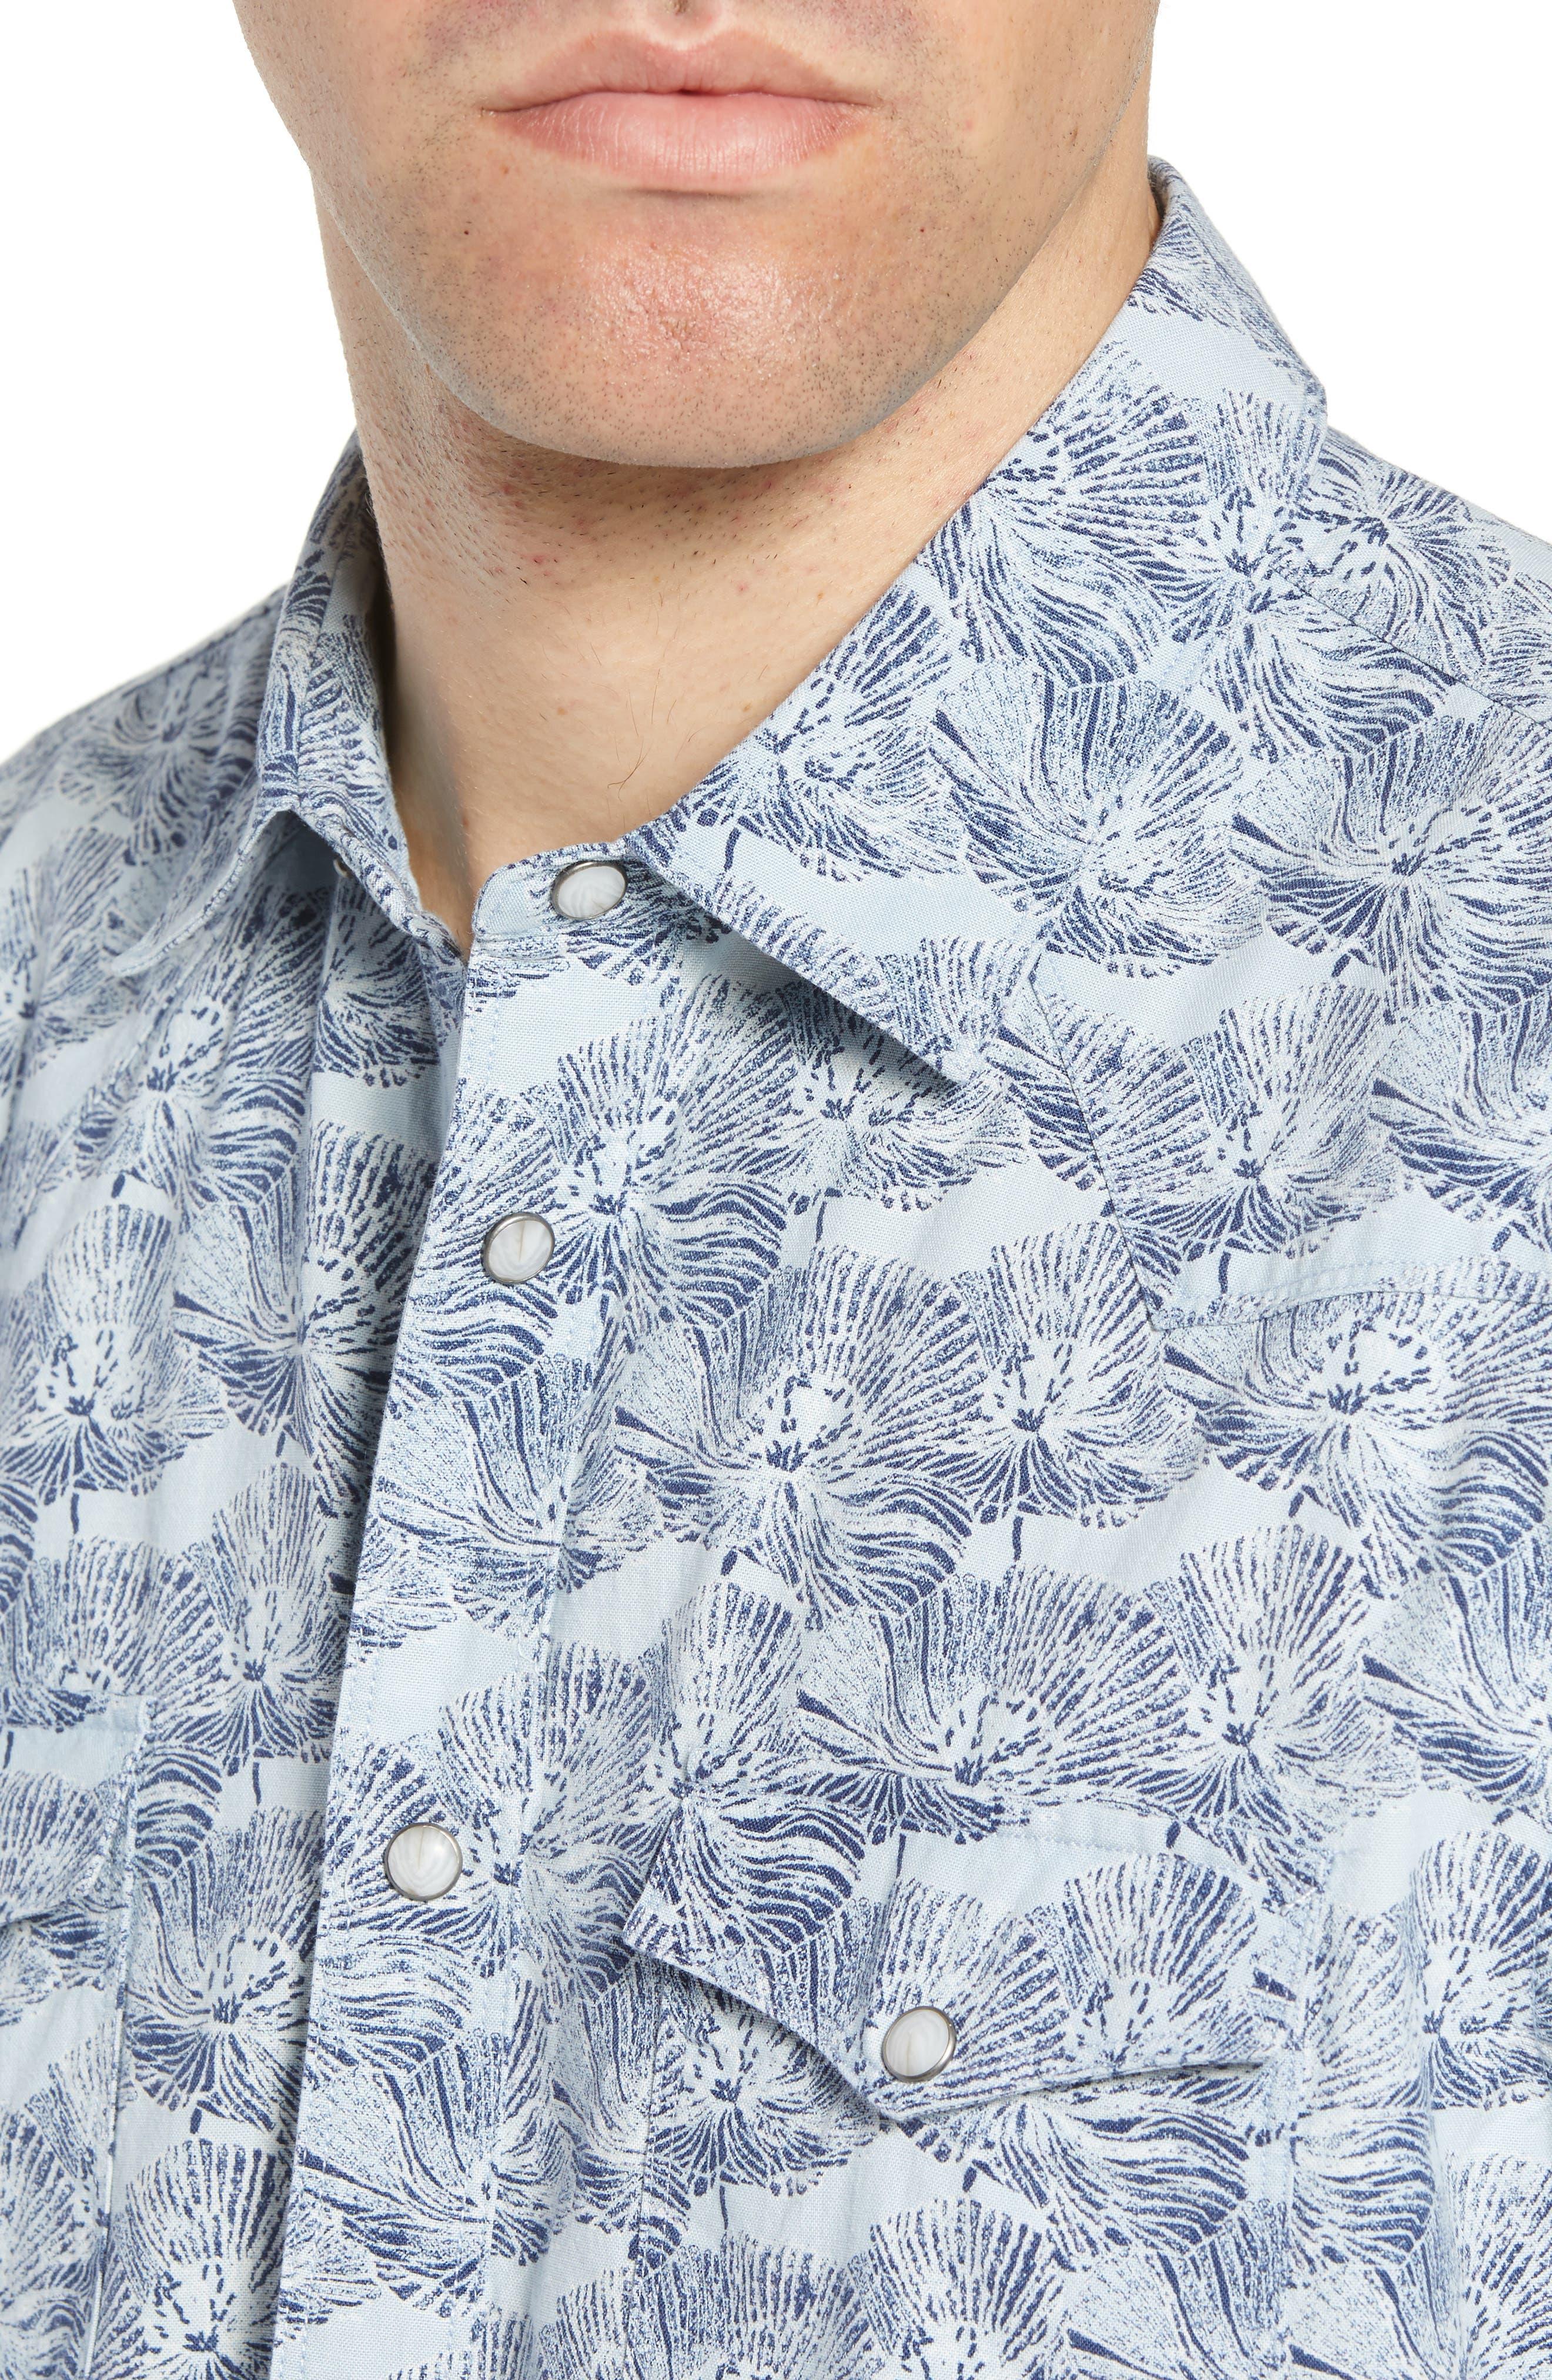 Zumas Vaquero Regular Fit Floral Sport Shirt,                             Alternate thumbnail 2, color,                             Indigo